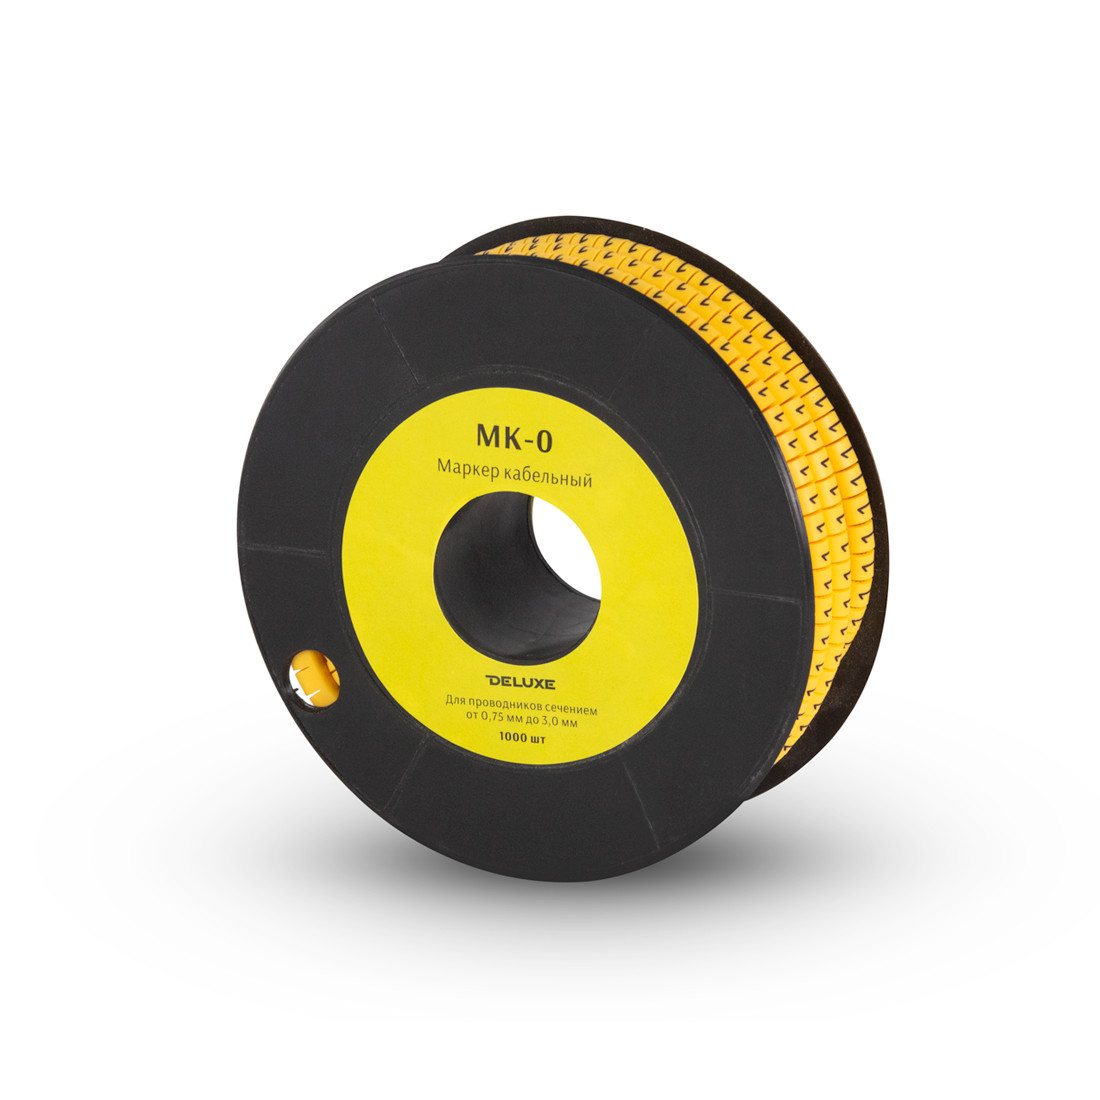 "Маркер кабельный Deluxe МК-0 (075-30 мм) символ ""4"" (1000 шт/упак.)"